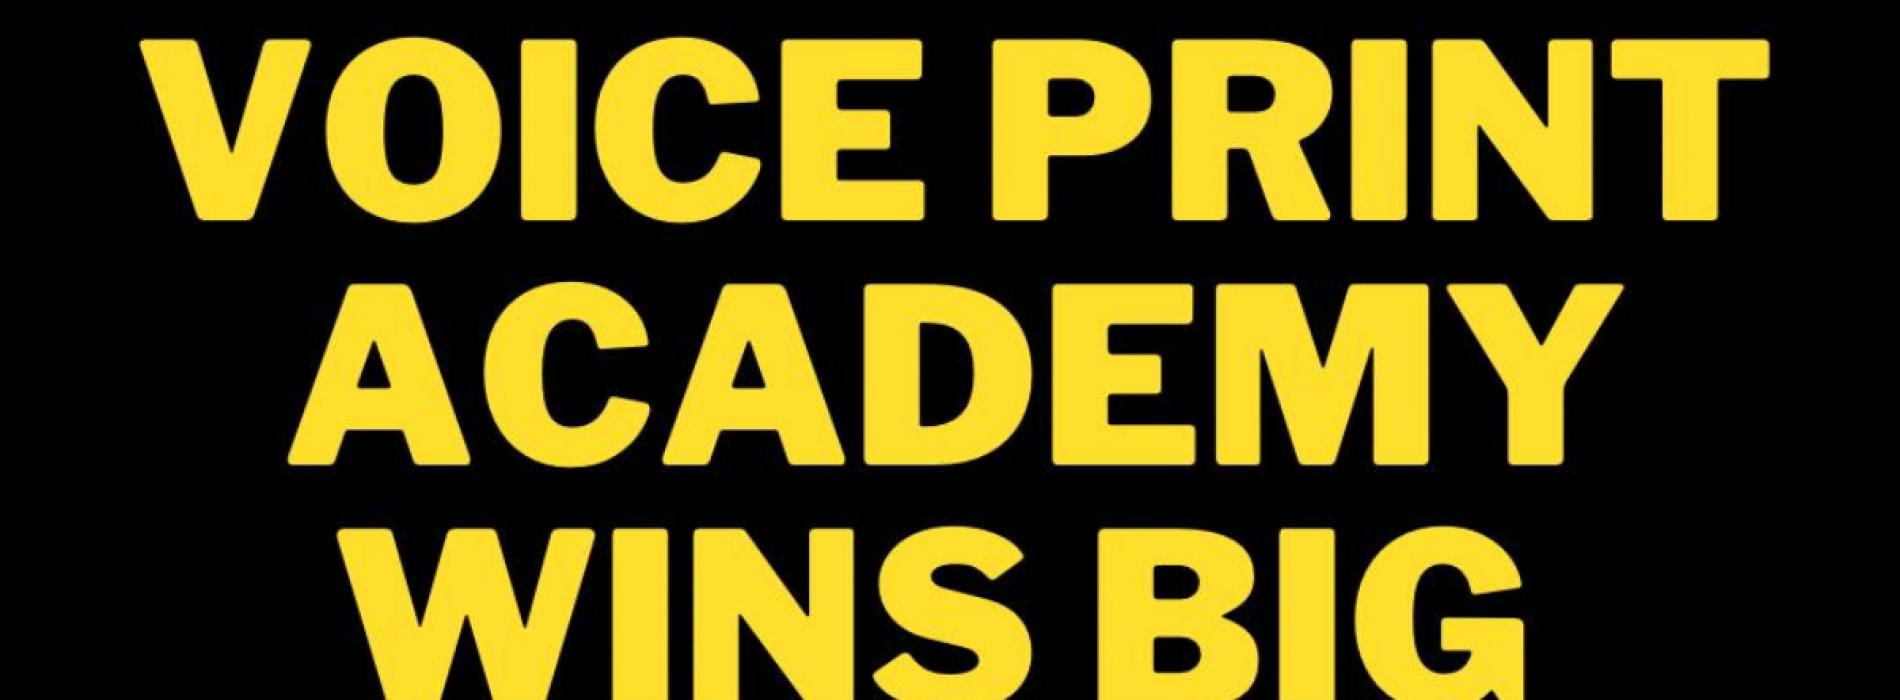 The Voice Print Academy Wins BIG!